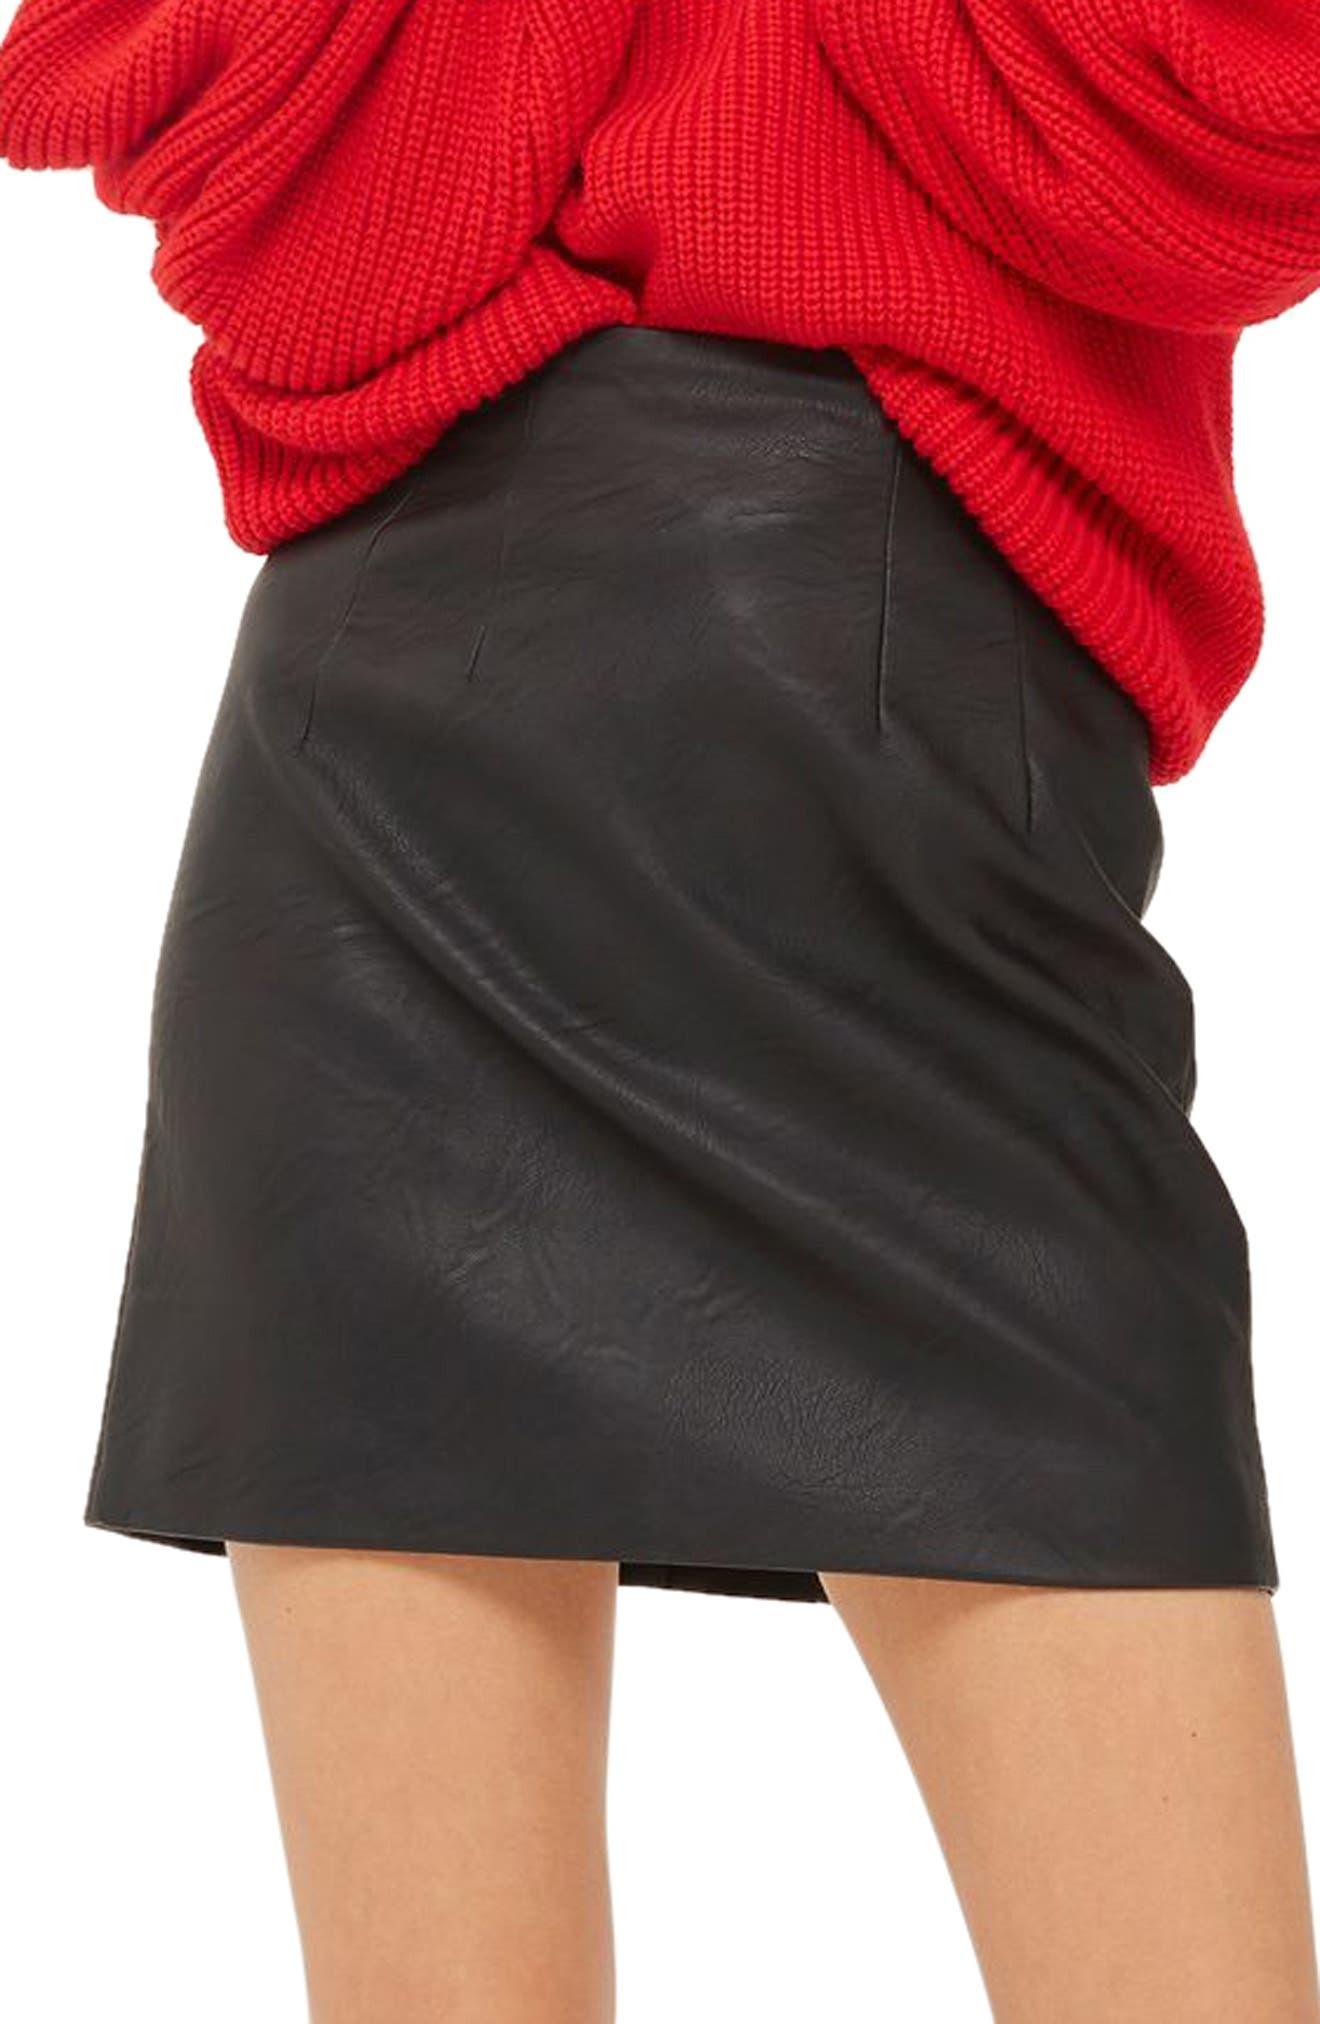 Main Image - Topshop Faux Leather Pencil Miniskirt